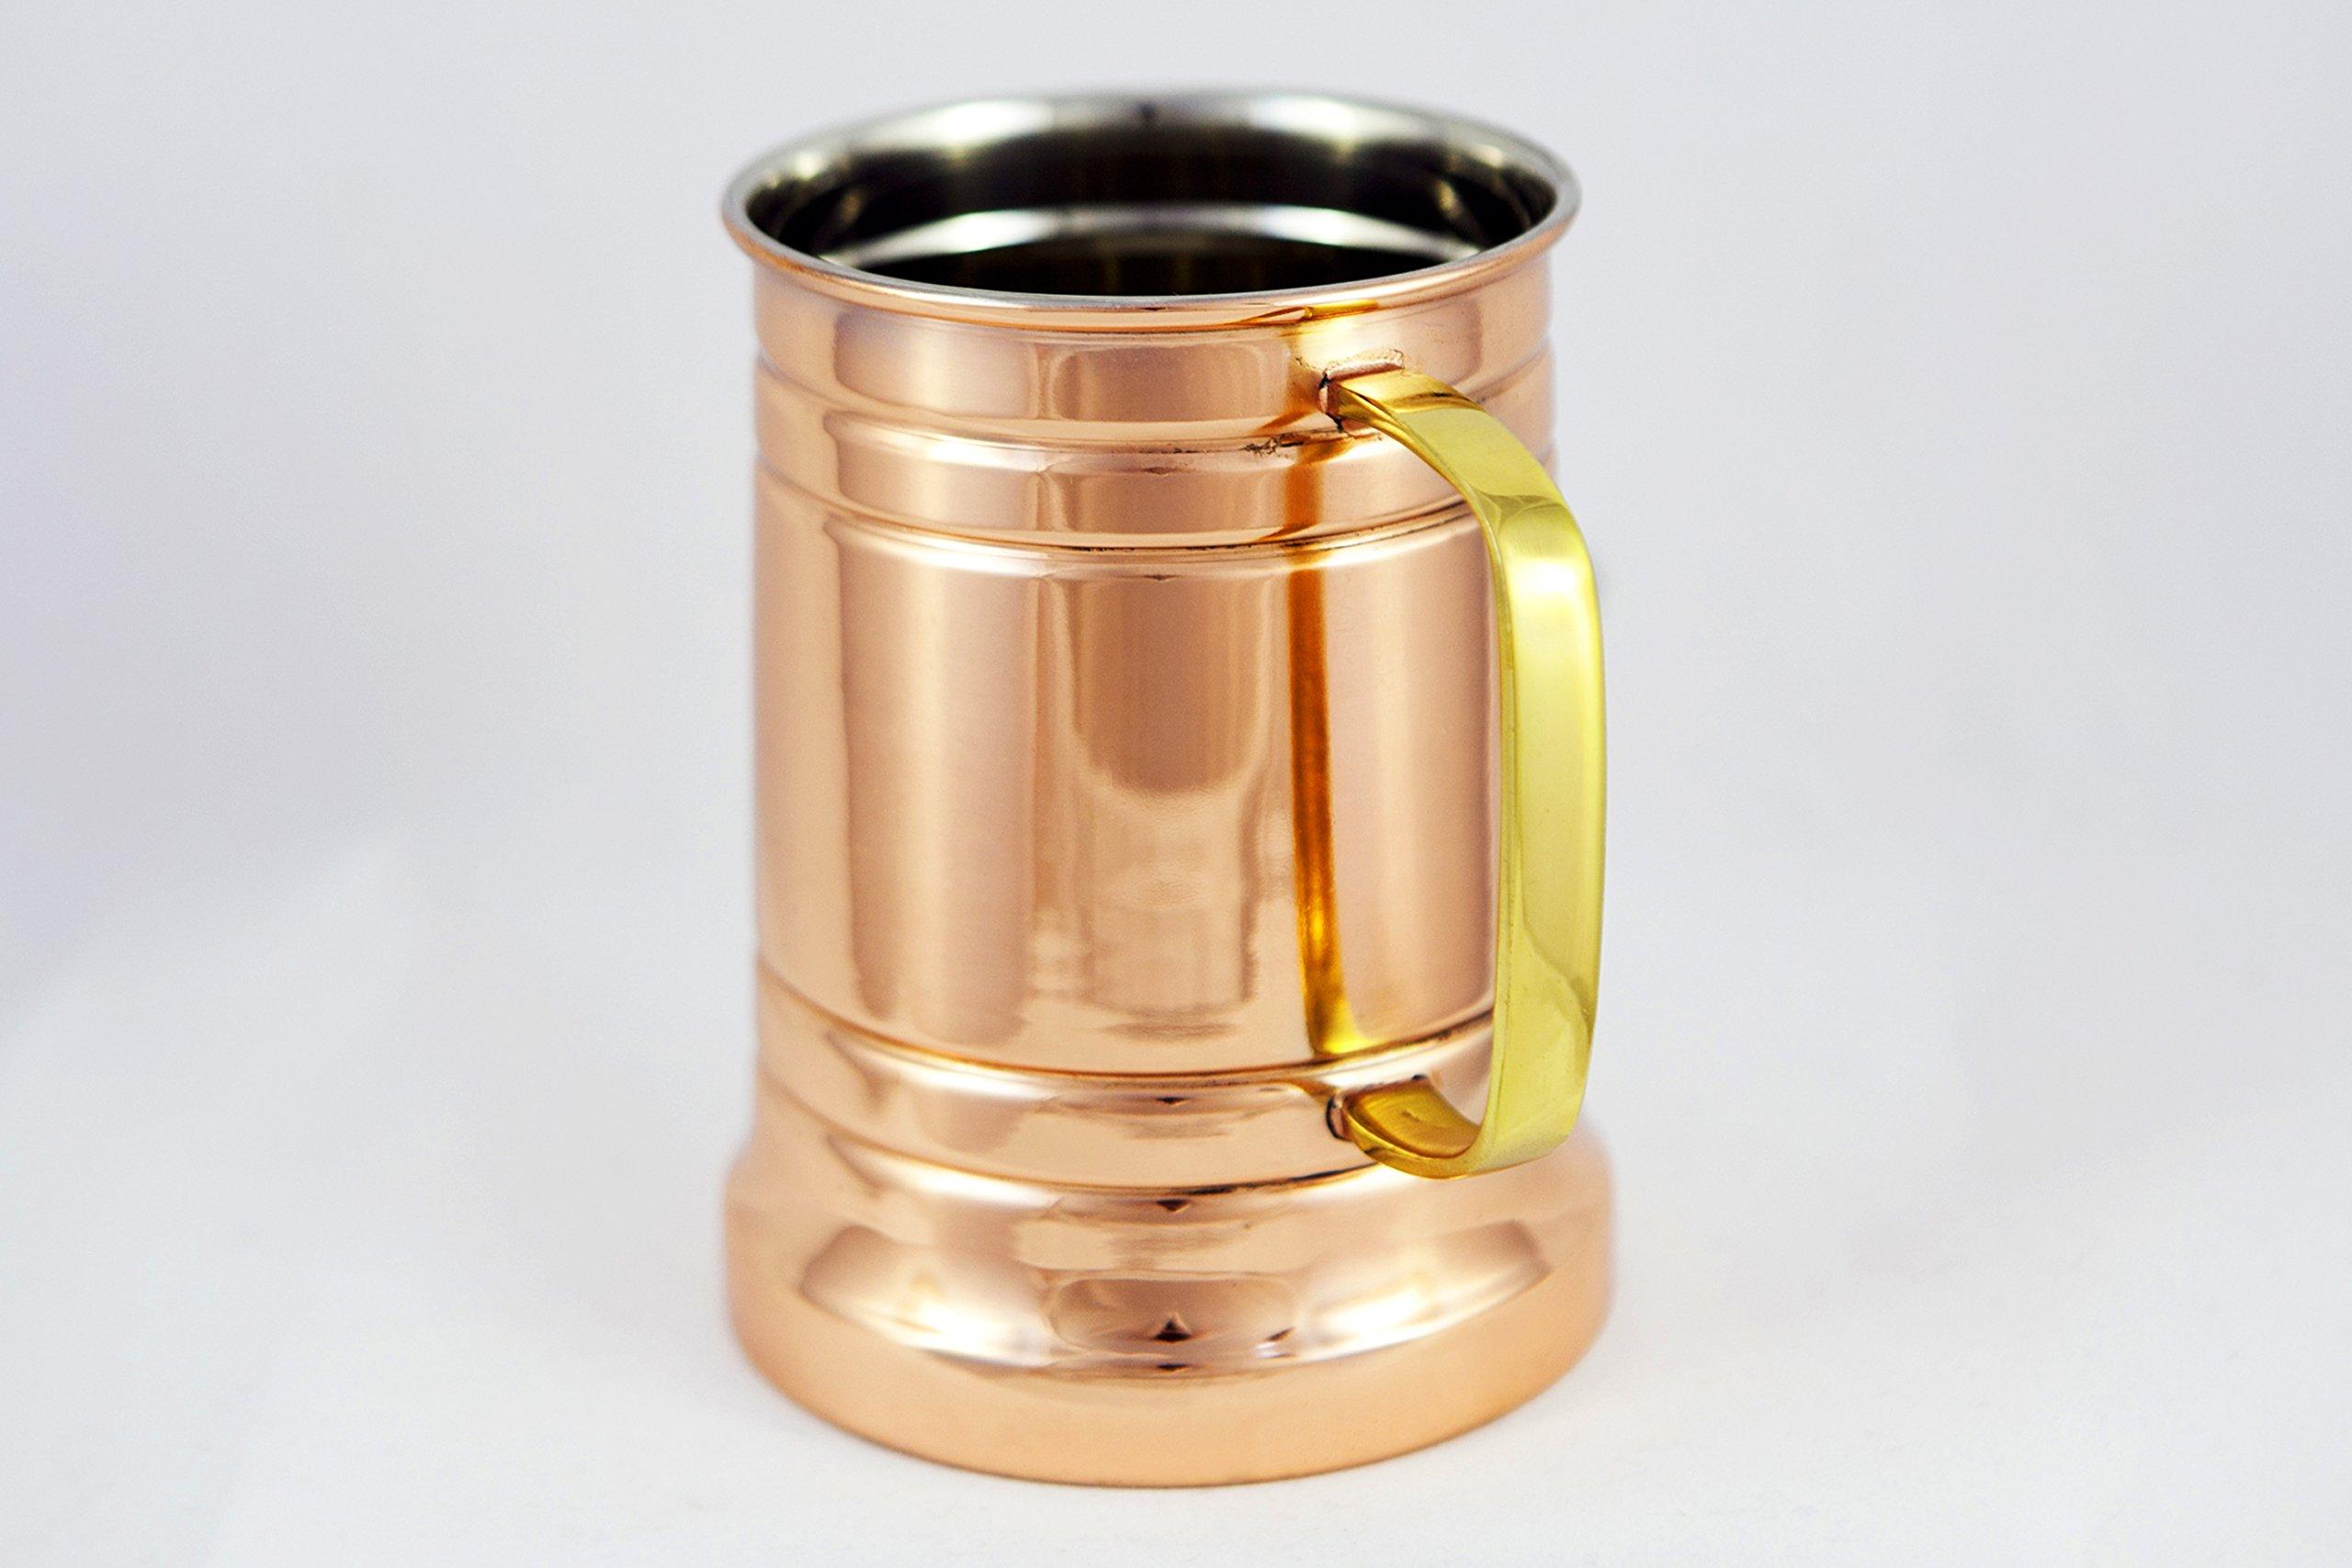 Copper German Beer Stein – Handcrafted Copper Antique Large Beer Stein Mug, Best Copper Tankard Mug Gift For Beer Or…